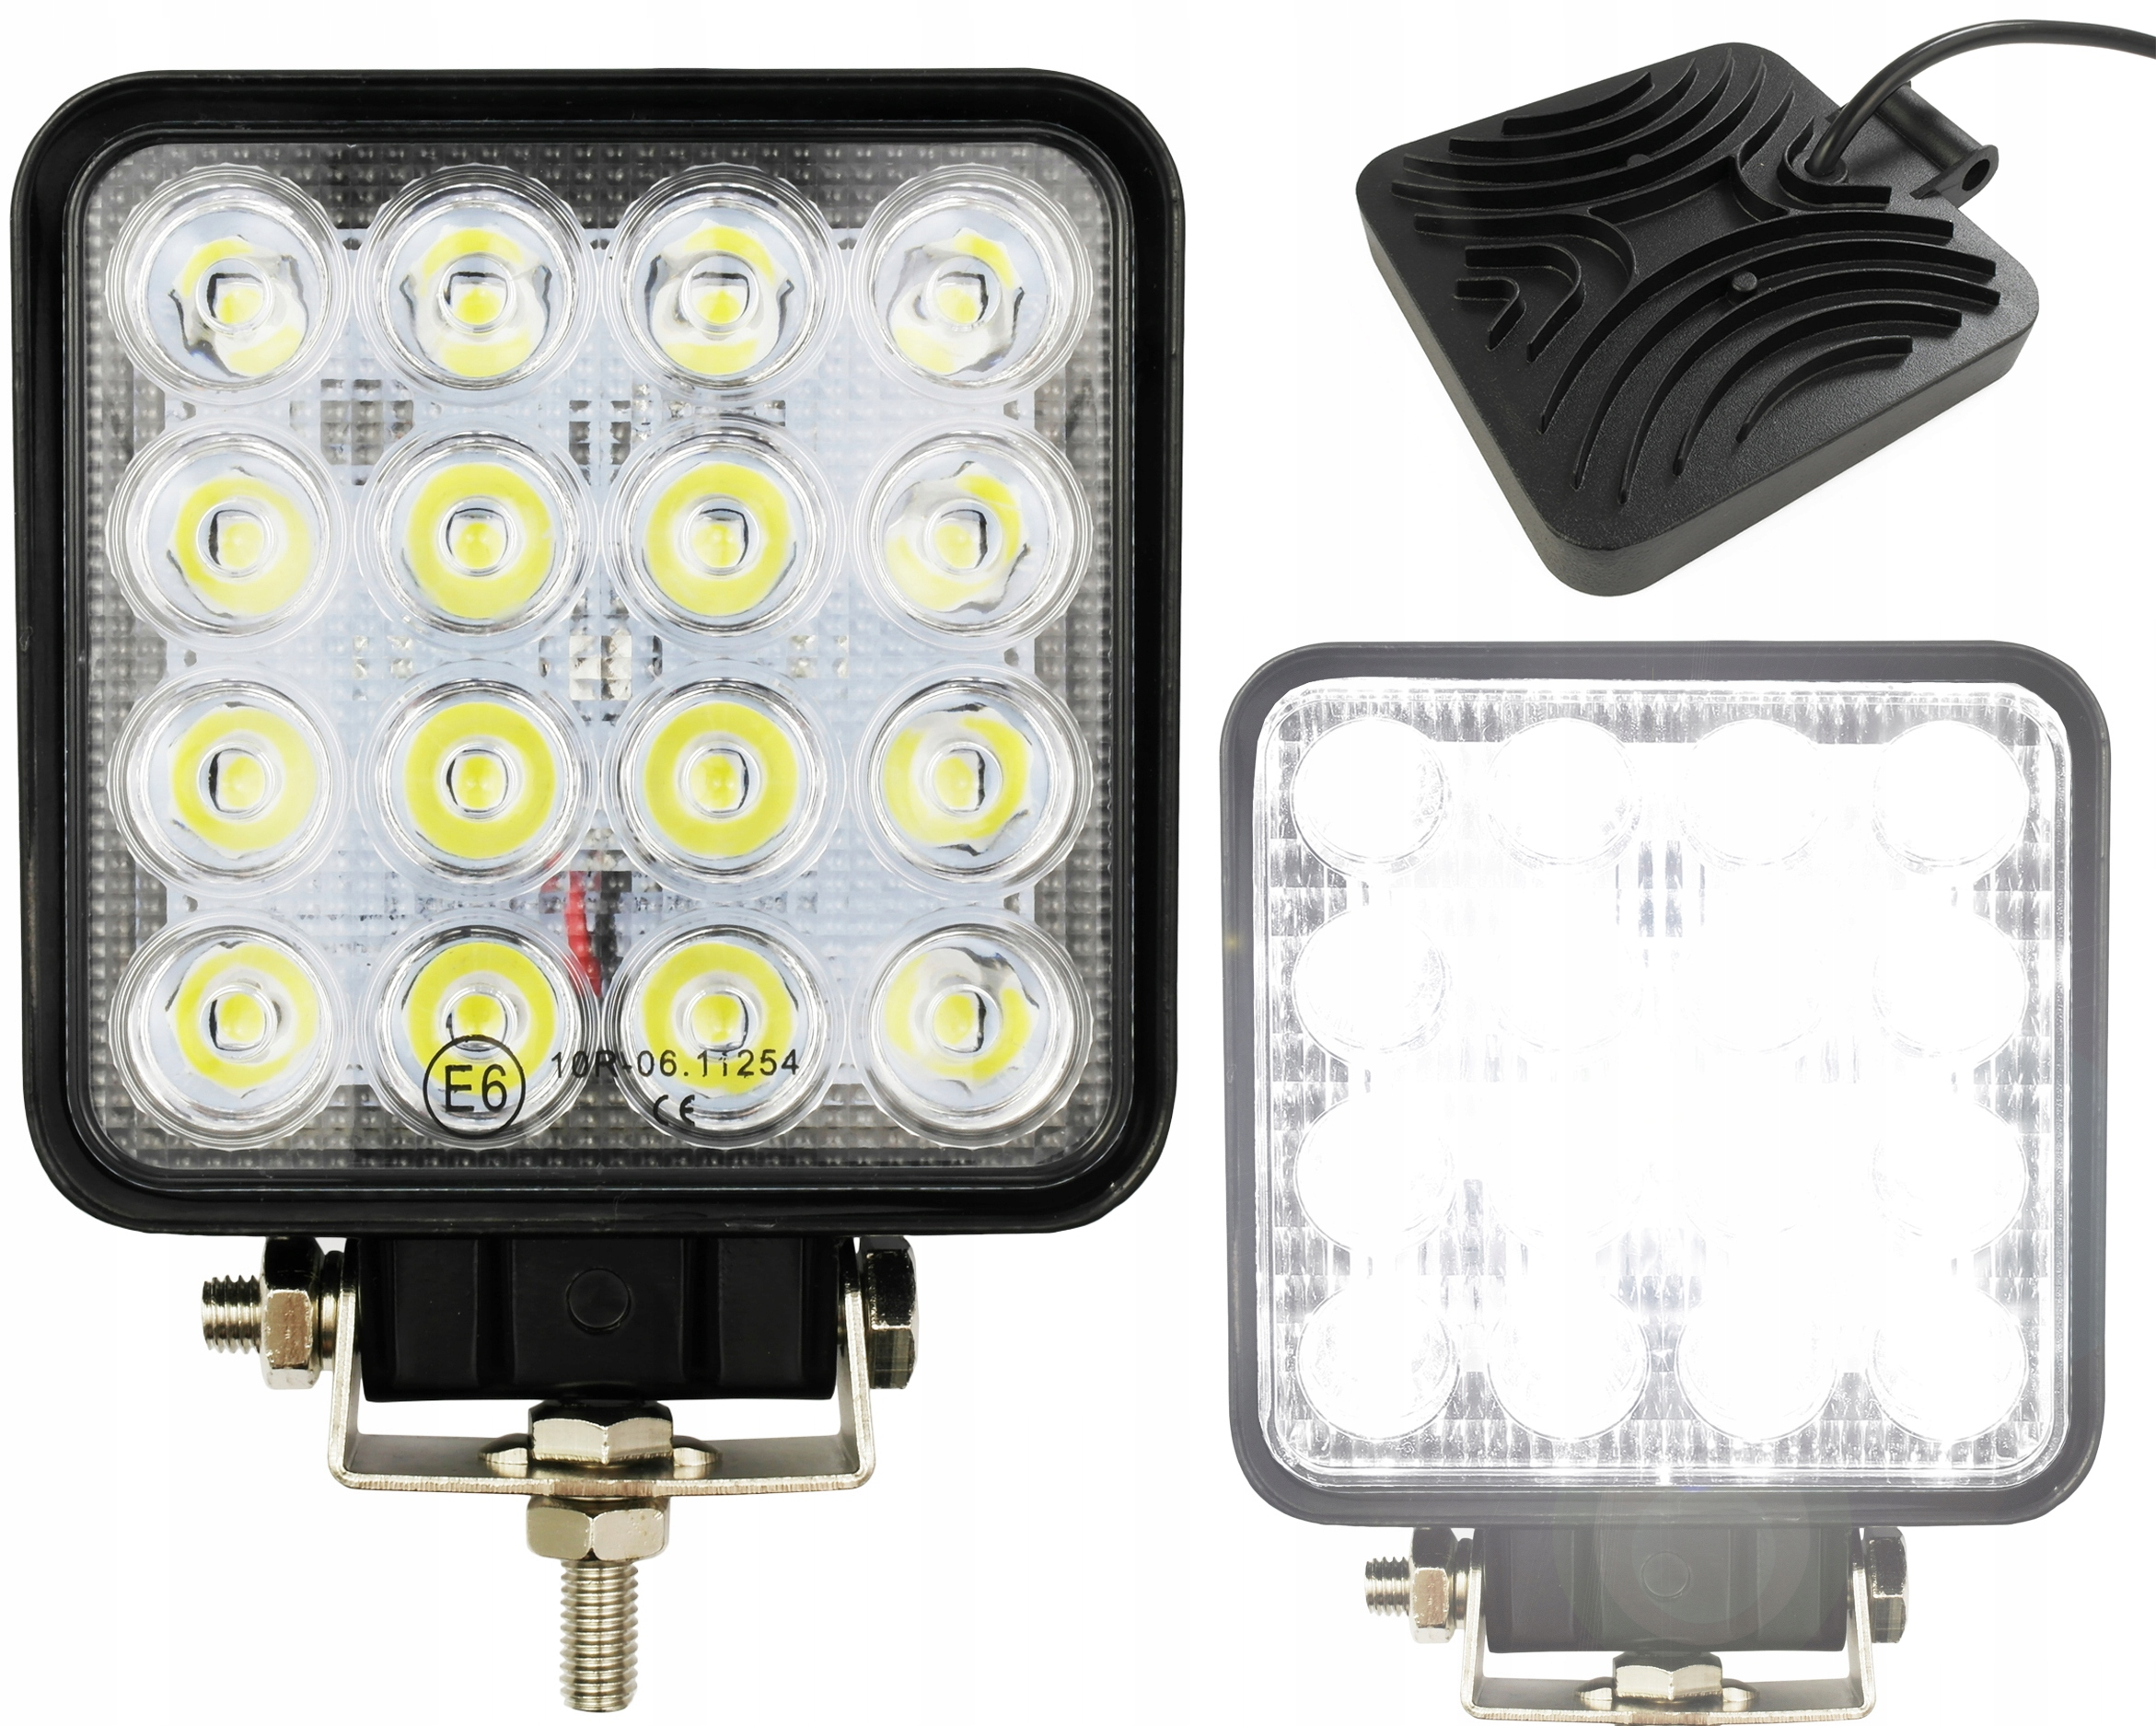 лампа 16 led галоген рабочий прожектора 48w 12v 24v